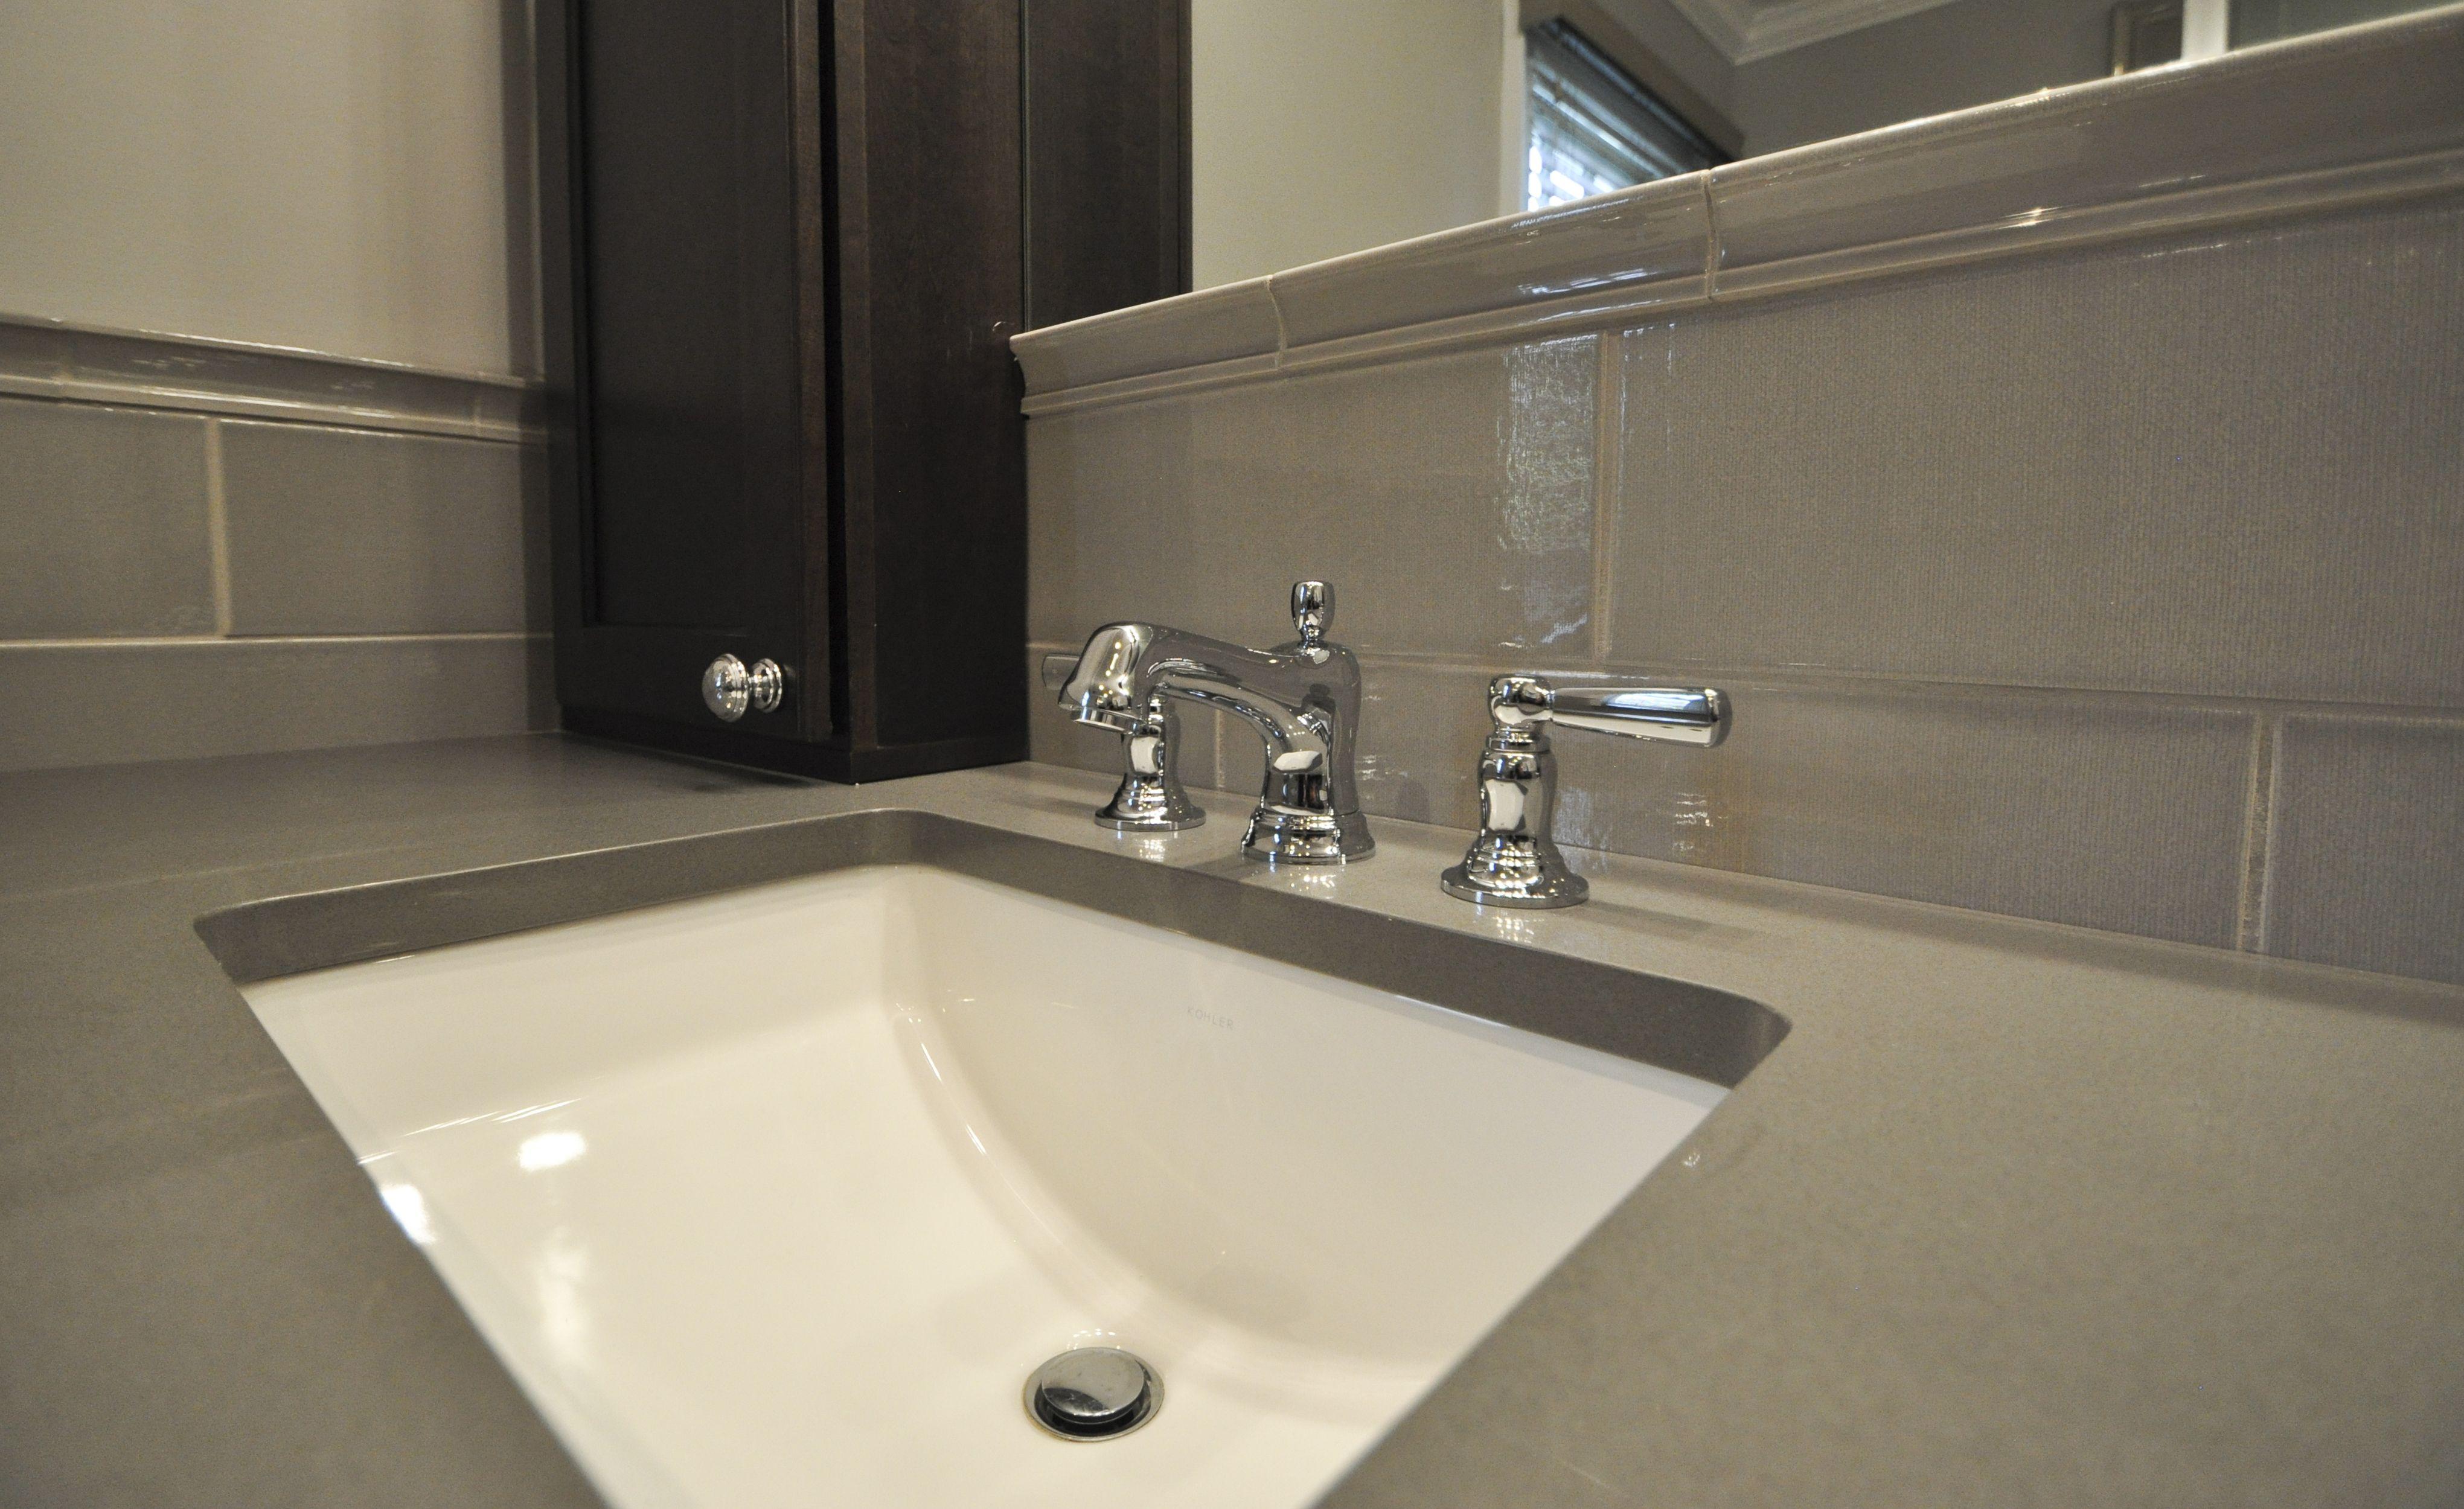 Kohler Chrome Fixtures Under Mount Sink Linen Ceramic Tile